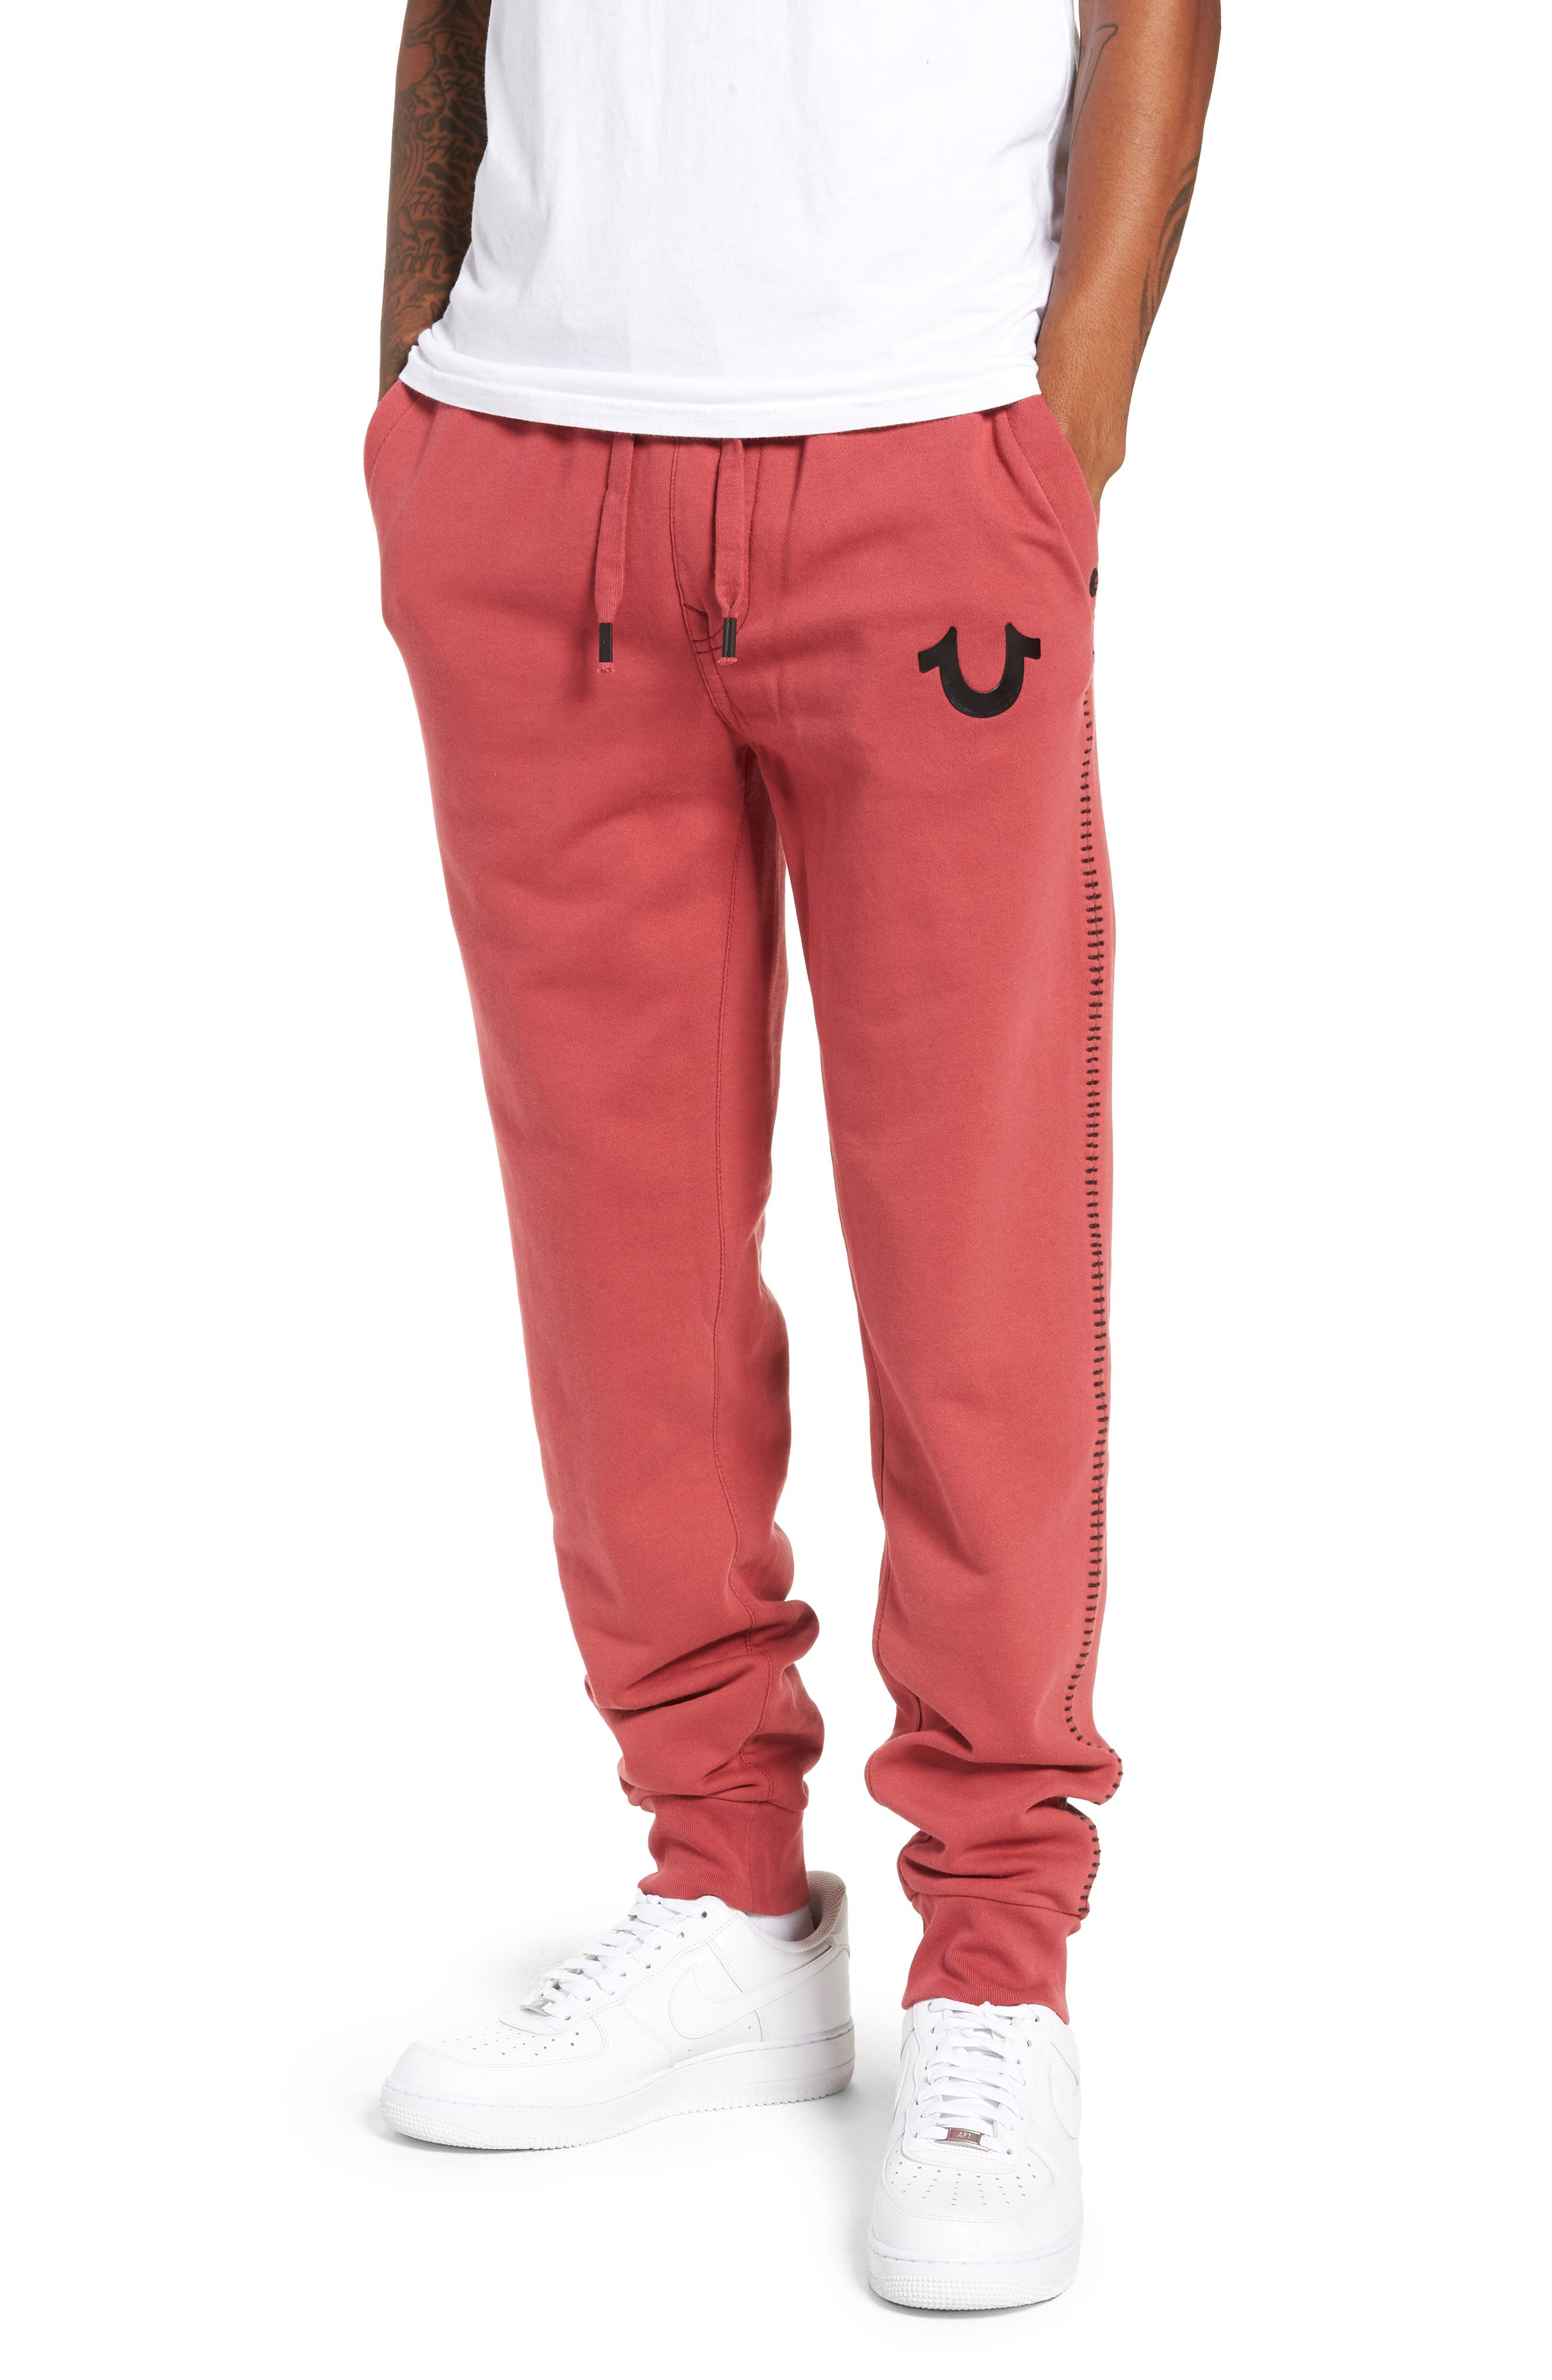 True Religion Brand Jeans Metallic Buddha Slim Fit Sweatpants, Red